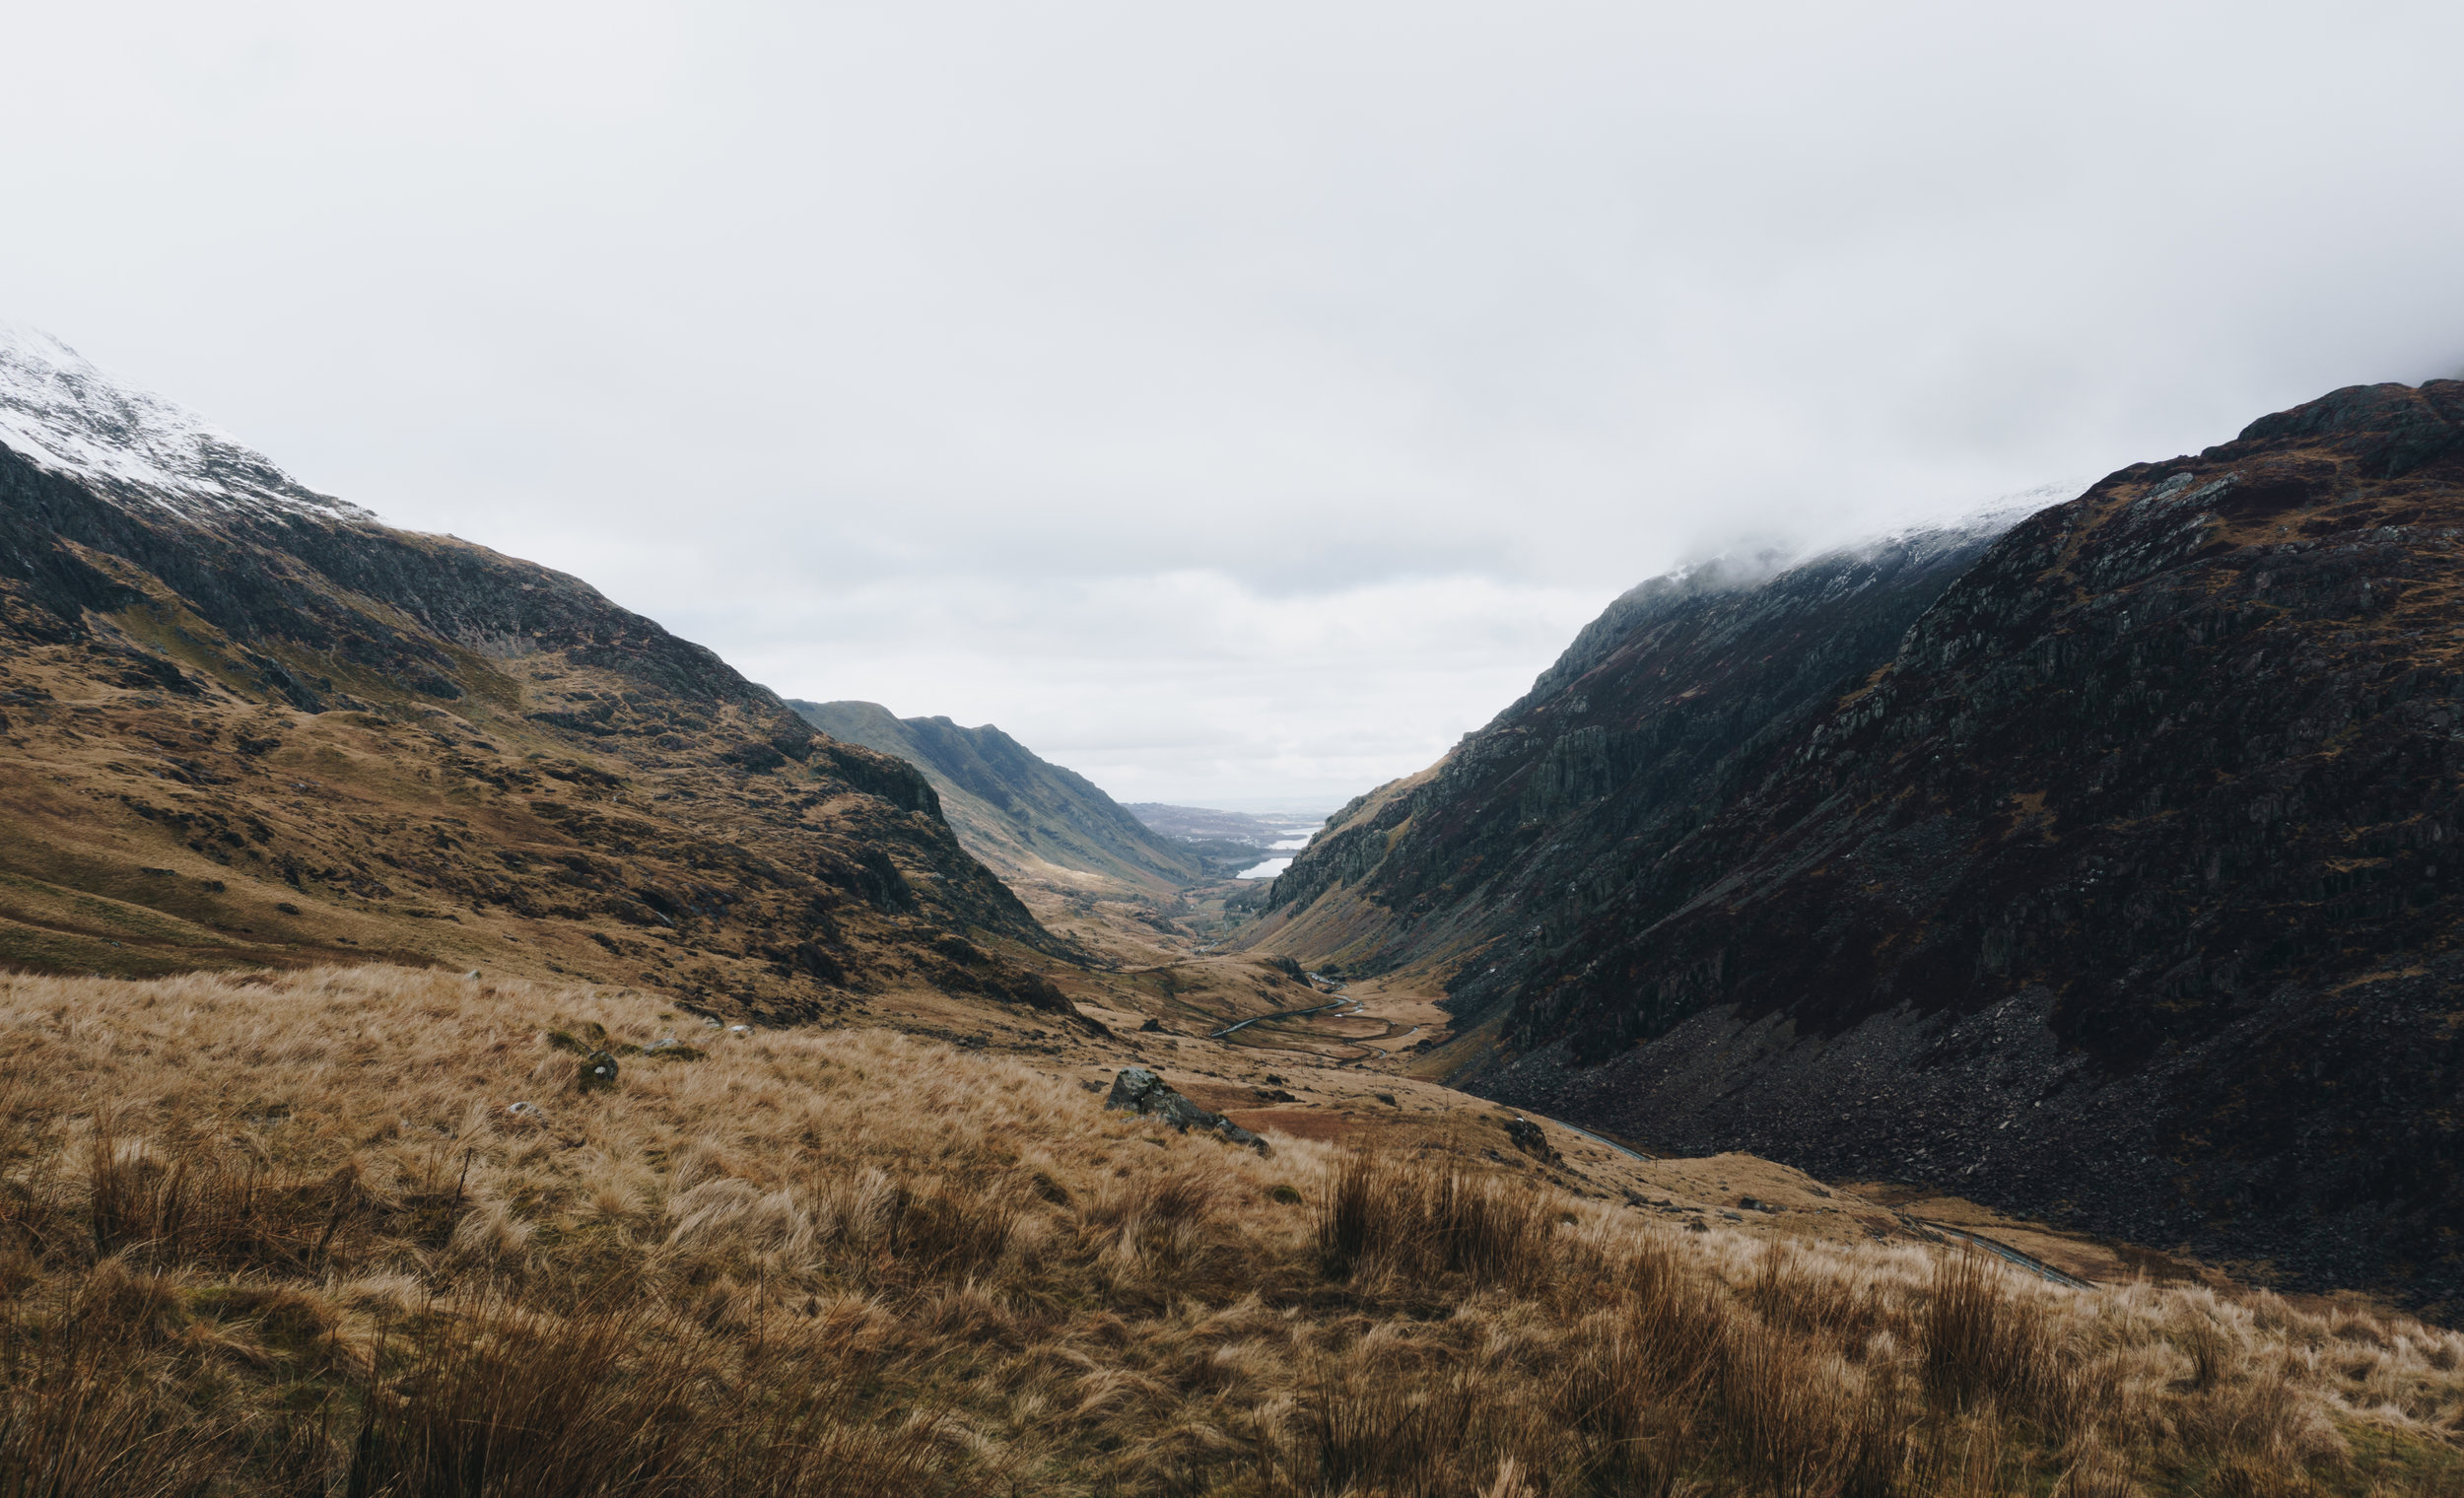 Snowdonia – July 2017